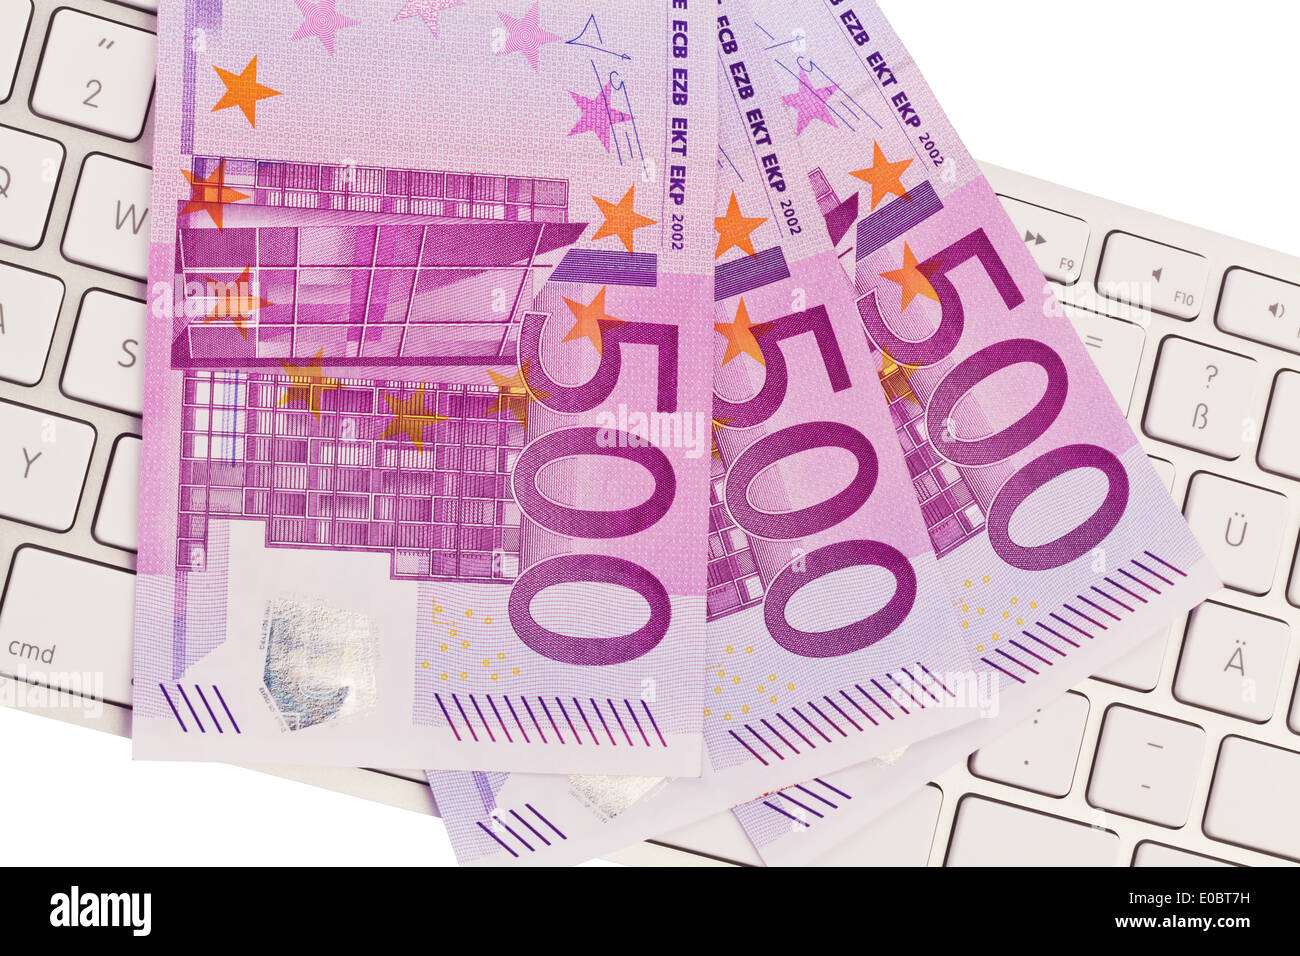 A lot of 500 euromoney bank notes lies on a pile. On a computer keyboard, Viele 500 Eurogeld Banknoten liegen auf Stock Photo